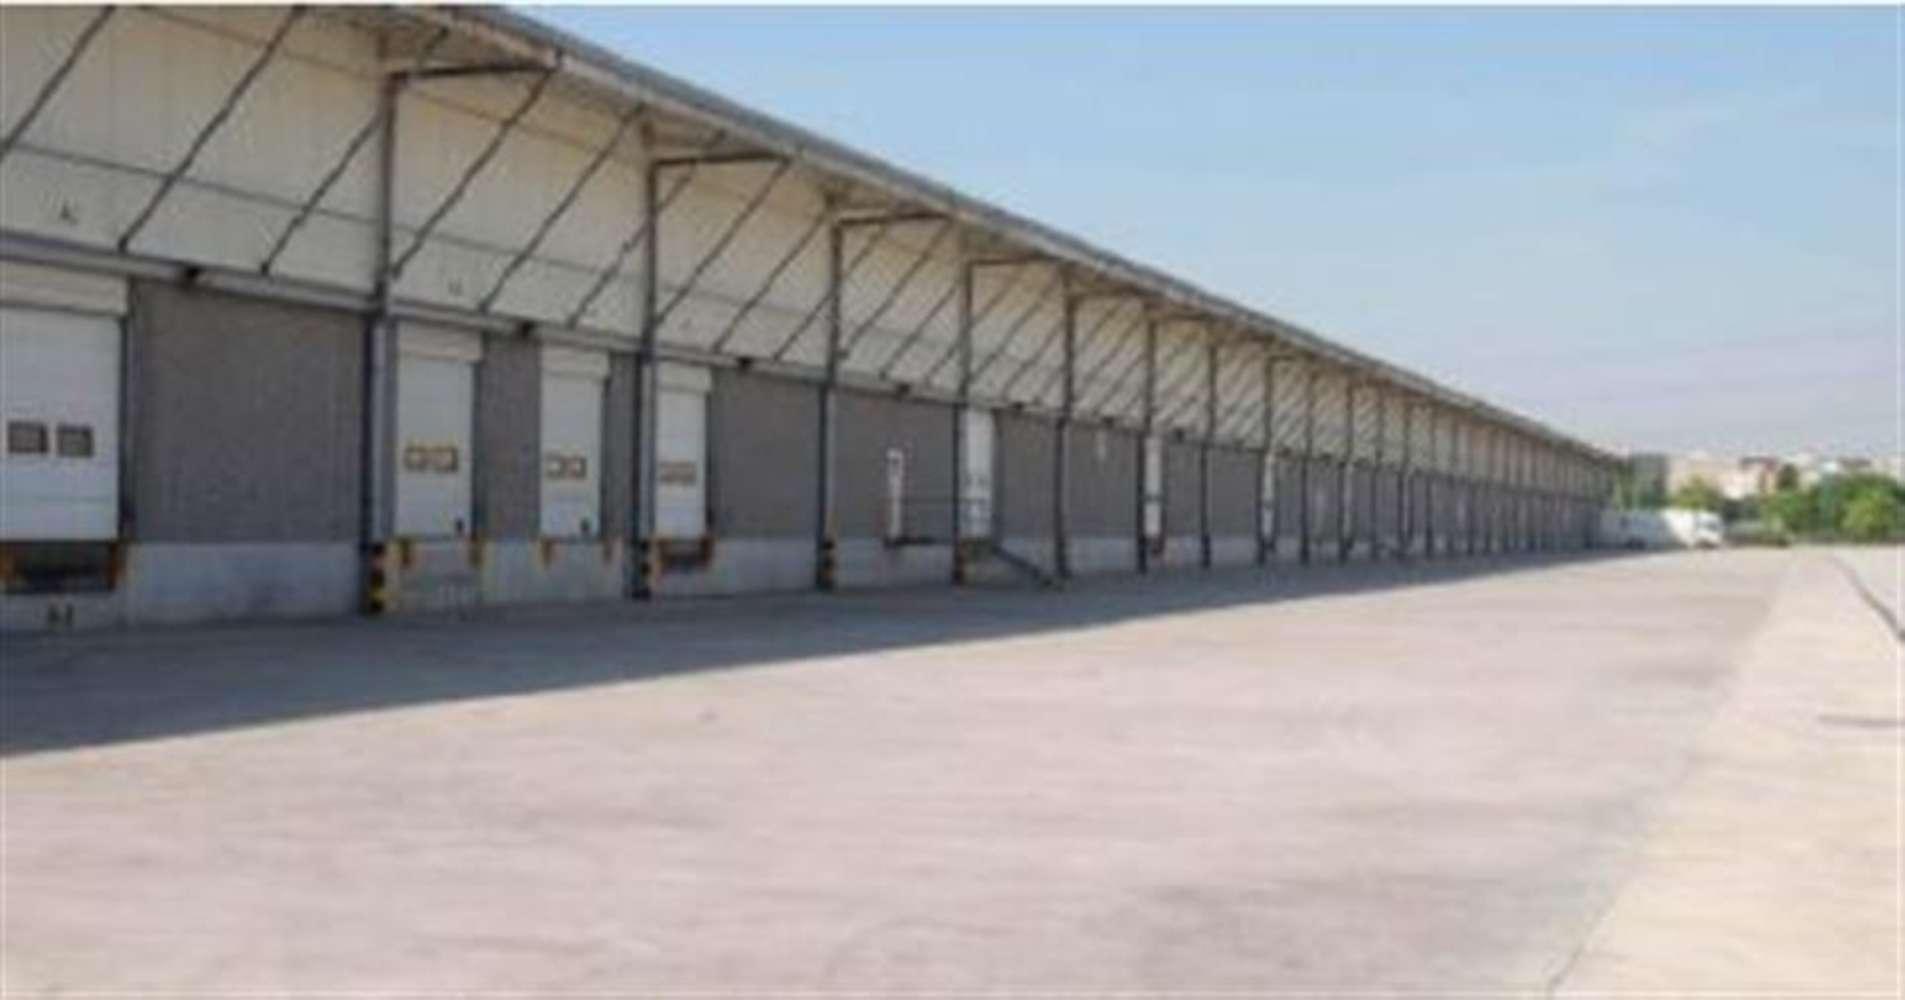 Naves industriales y logísticas Santa perpètua de mogoda, 08130 - Nave Logistica - B0187 - CIM VALLES - 11702